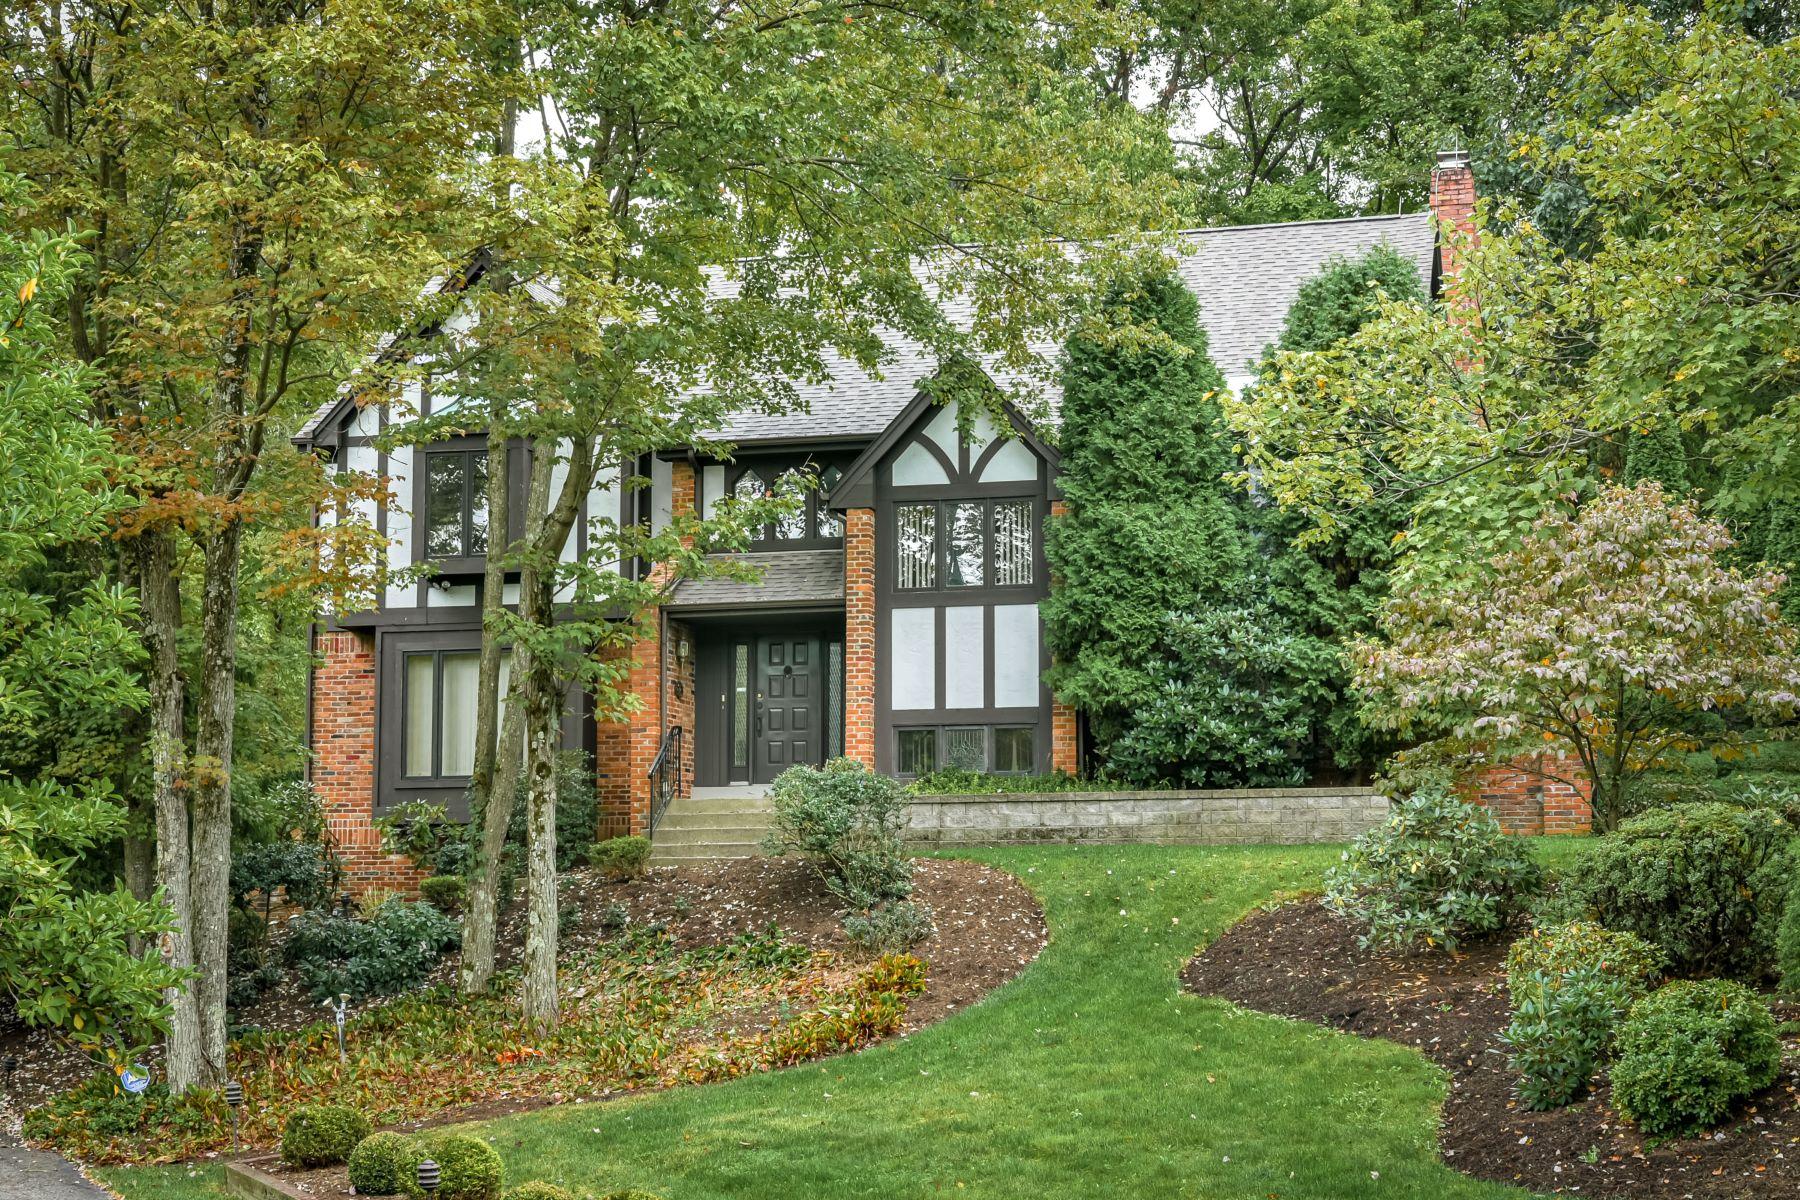 Single Family Homes for Sale at 4018 Letort Lane Allison Park, Pennsylvania 15101 United States